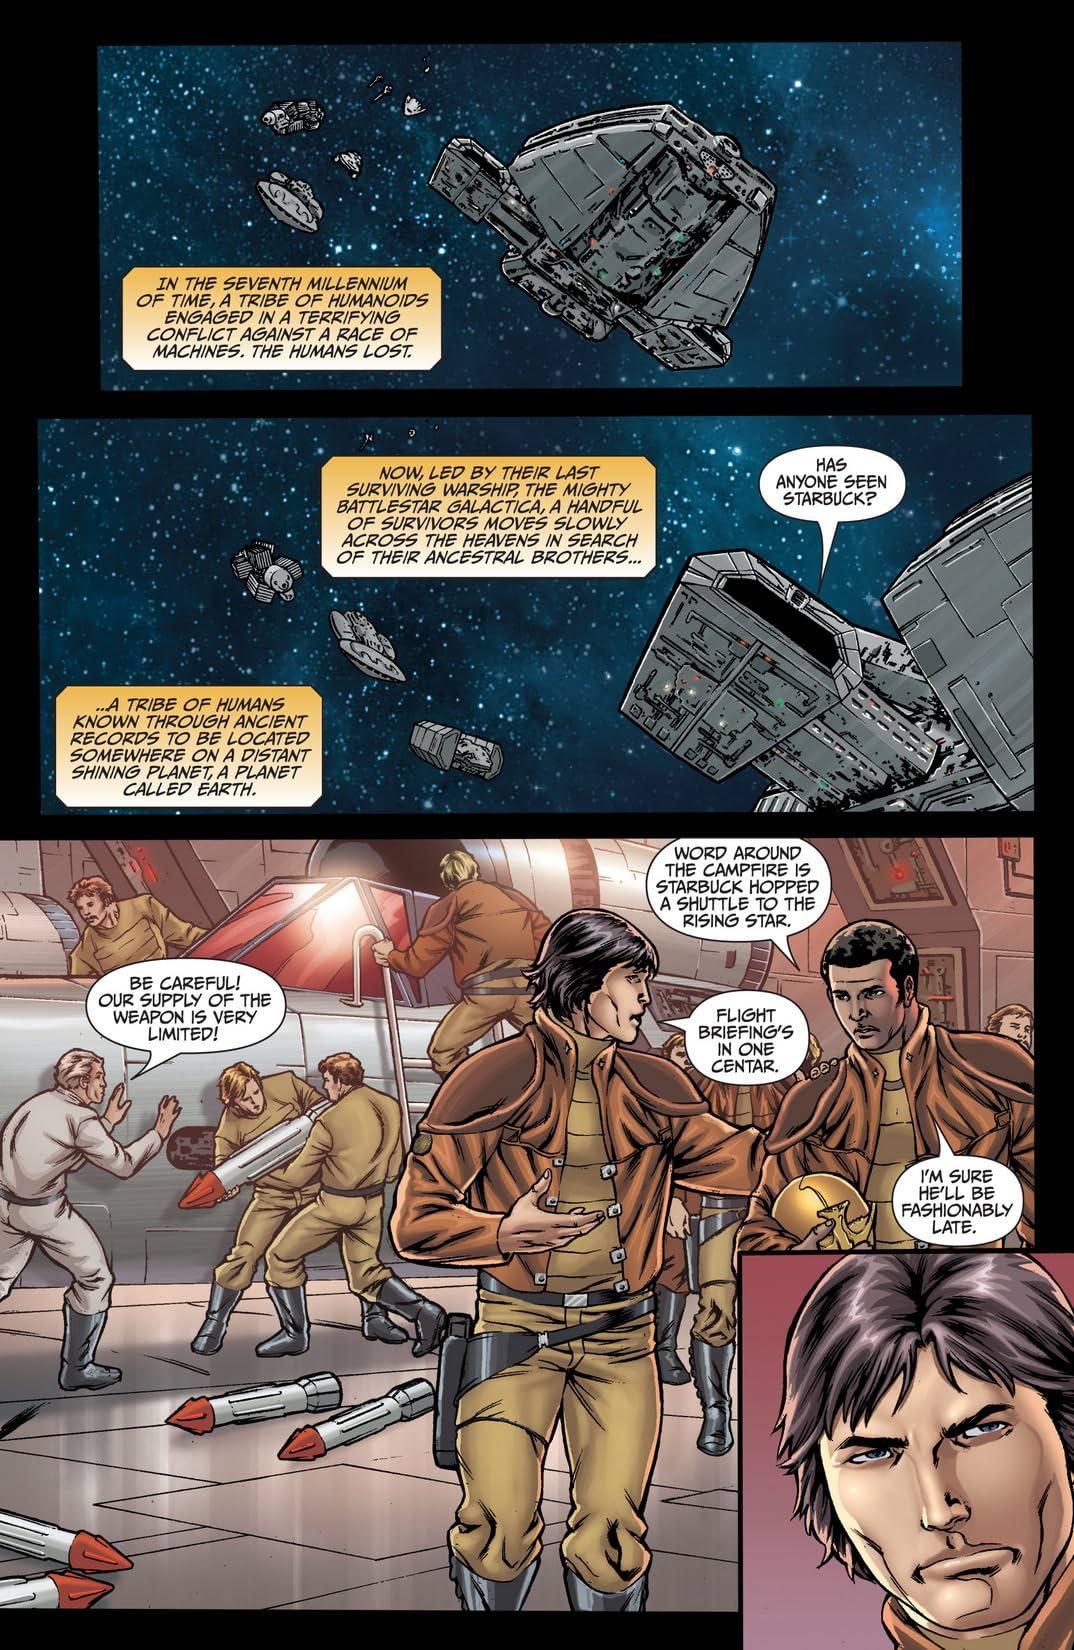 Classic Battlestar Galactica: Cylon Apocalypse #3